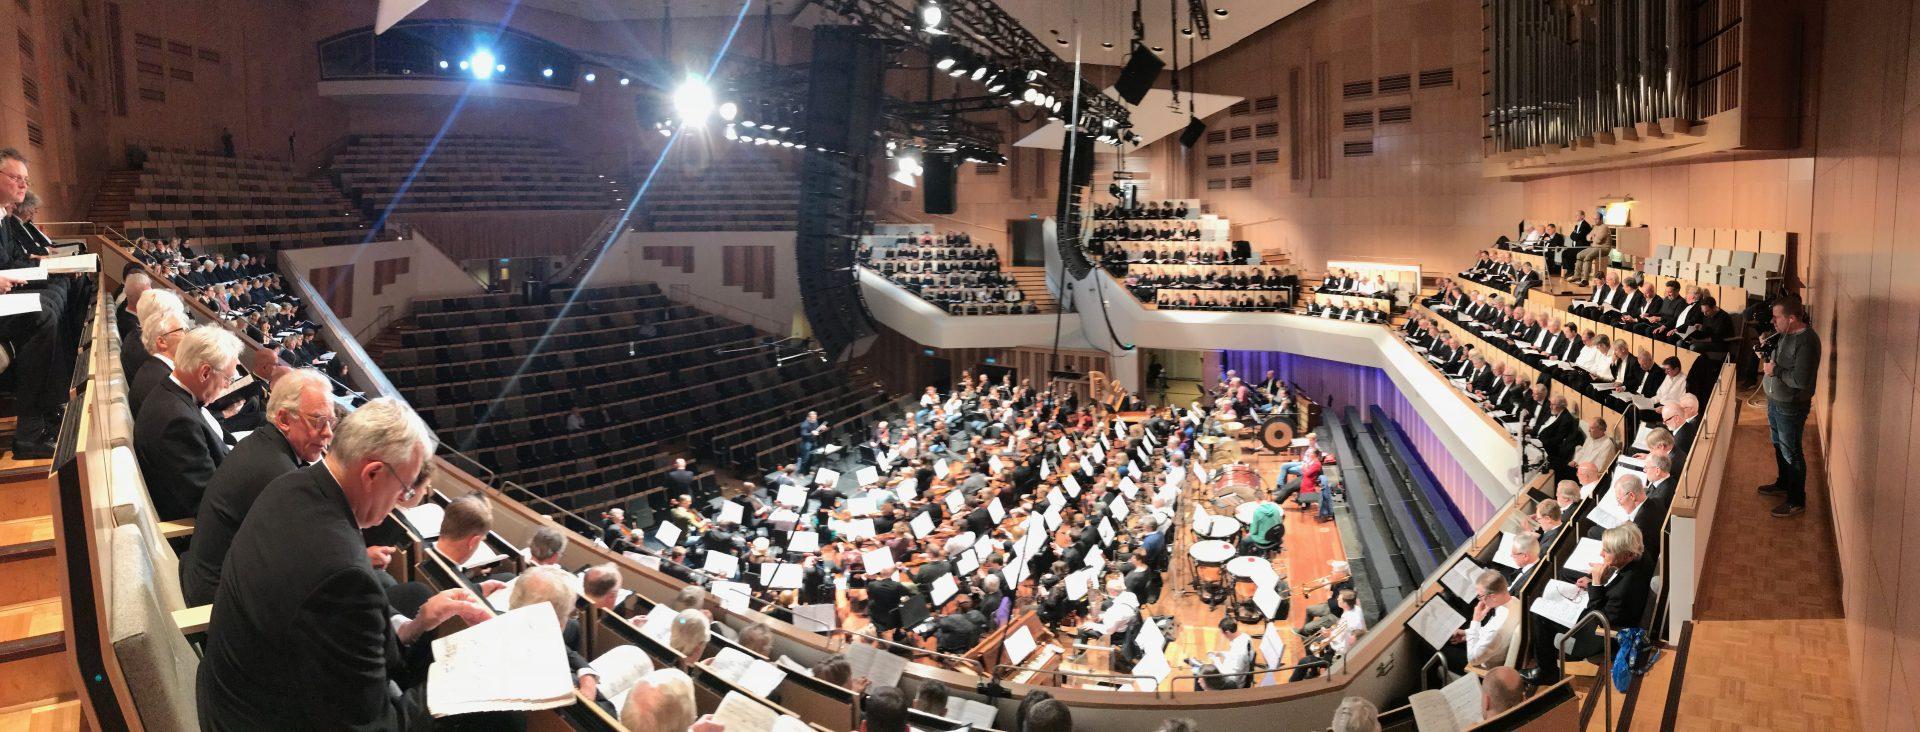 Documentaire Philips Symfonie Orkest